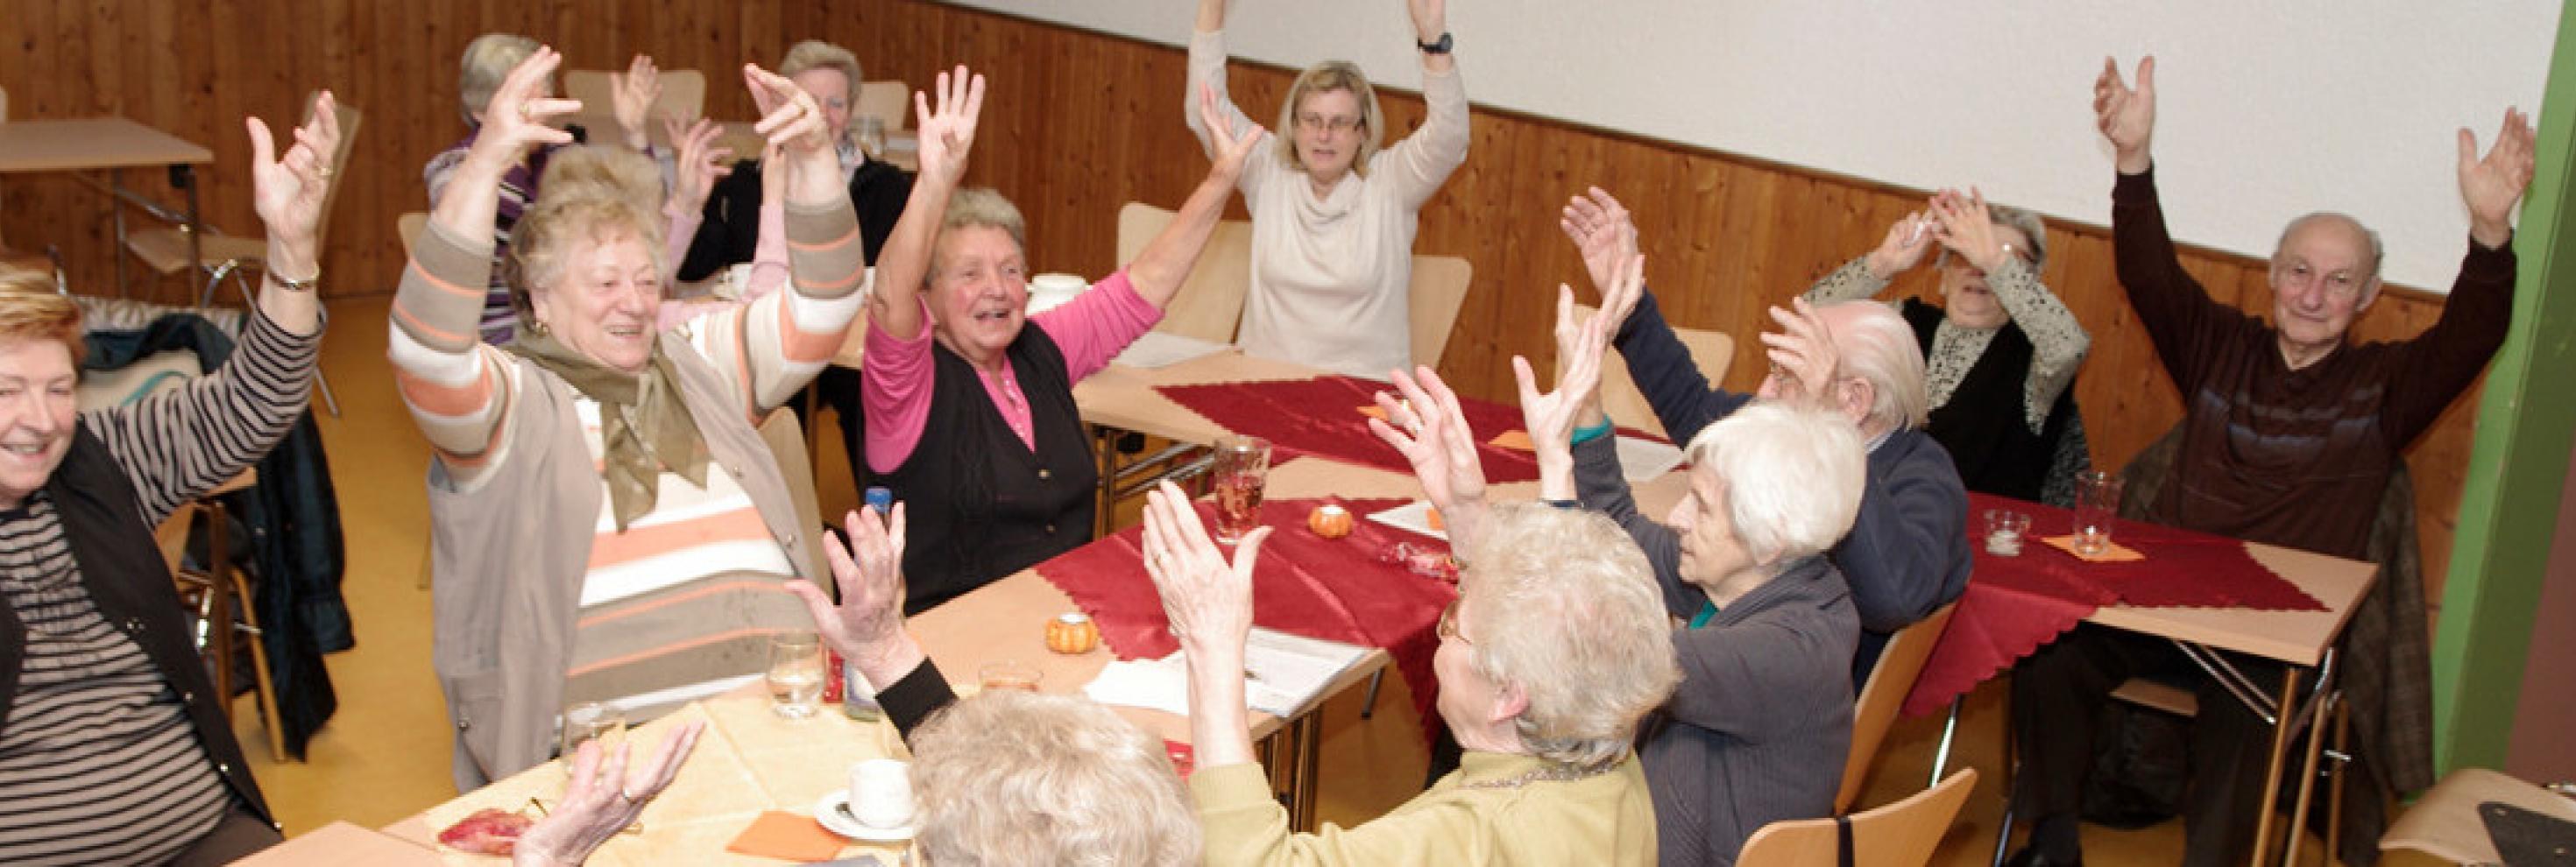 Senioren bei den NaturFreunden in Frankenthal